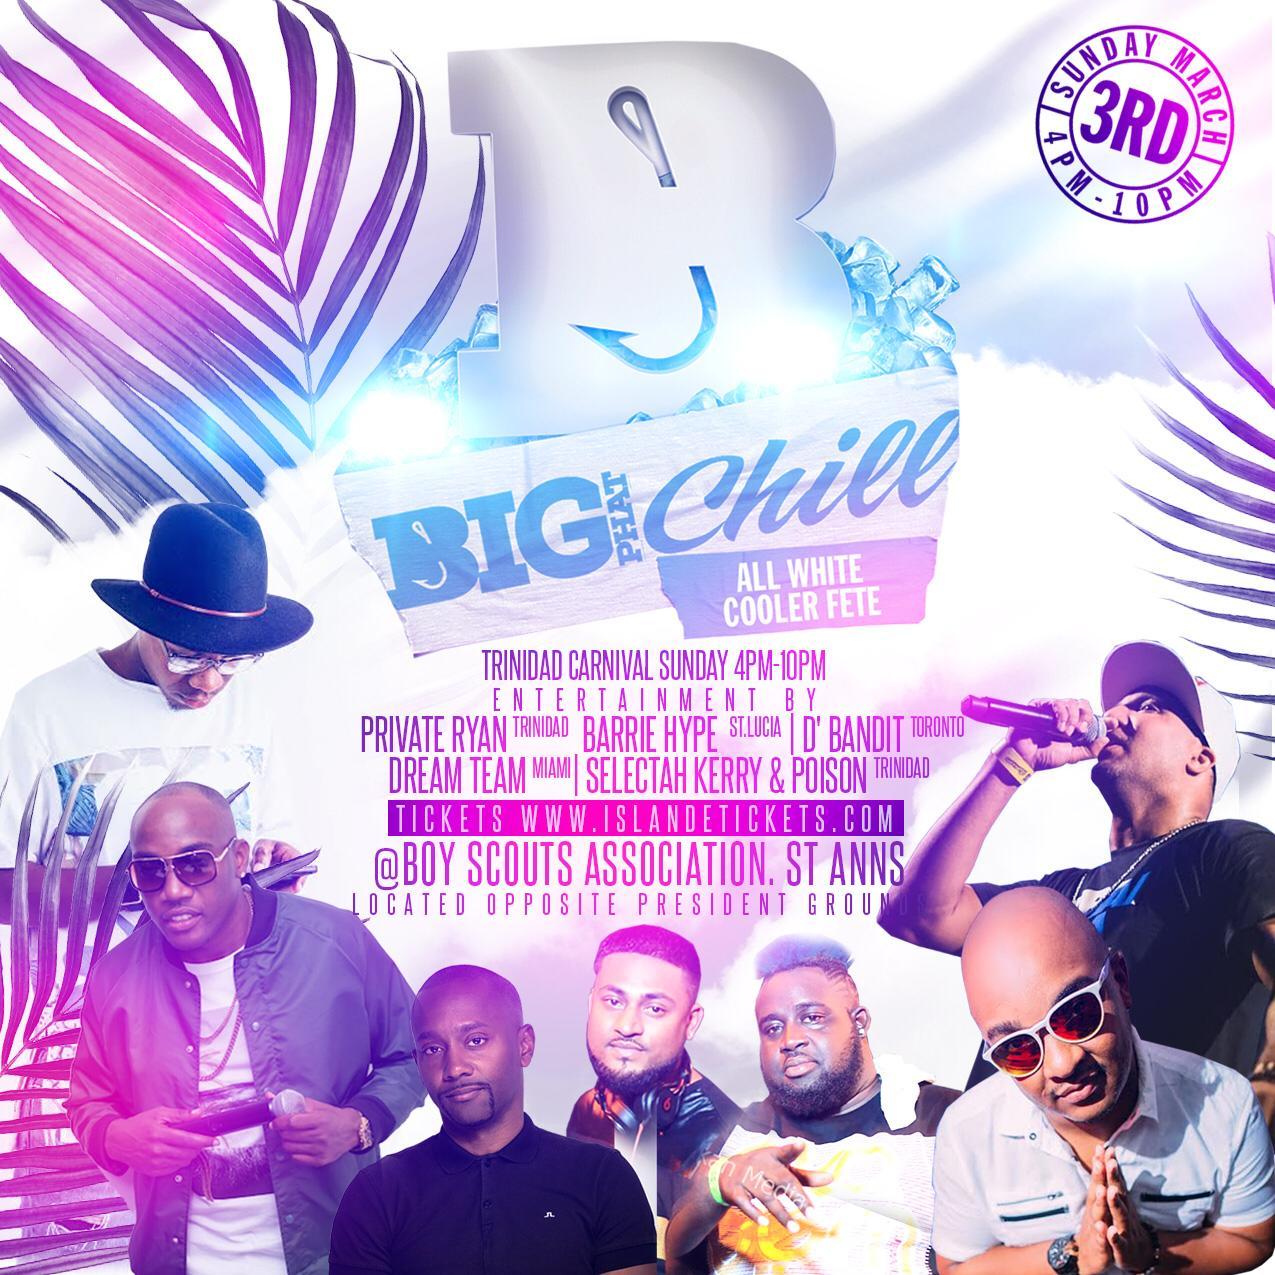 Big Phat Chill Trinidad